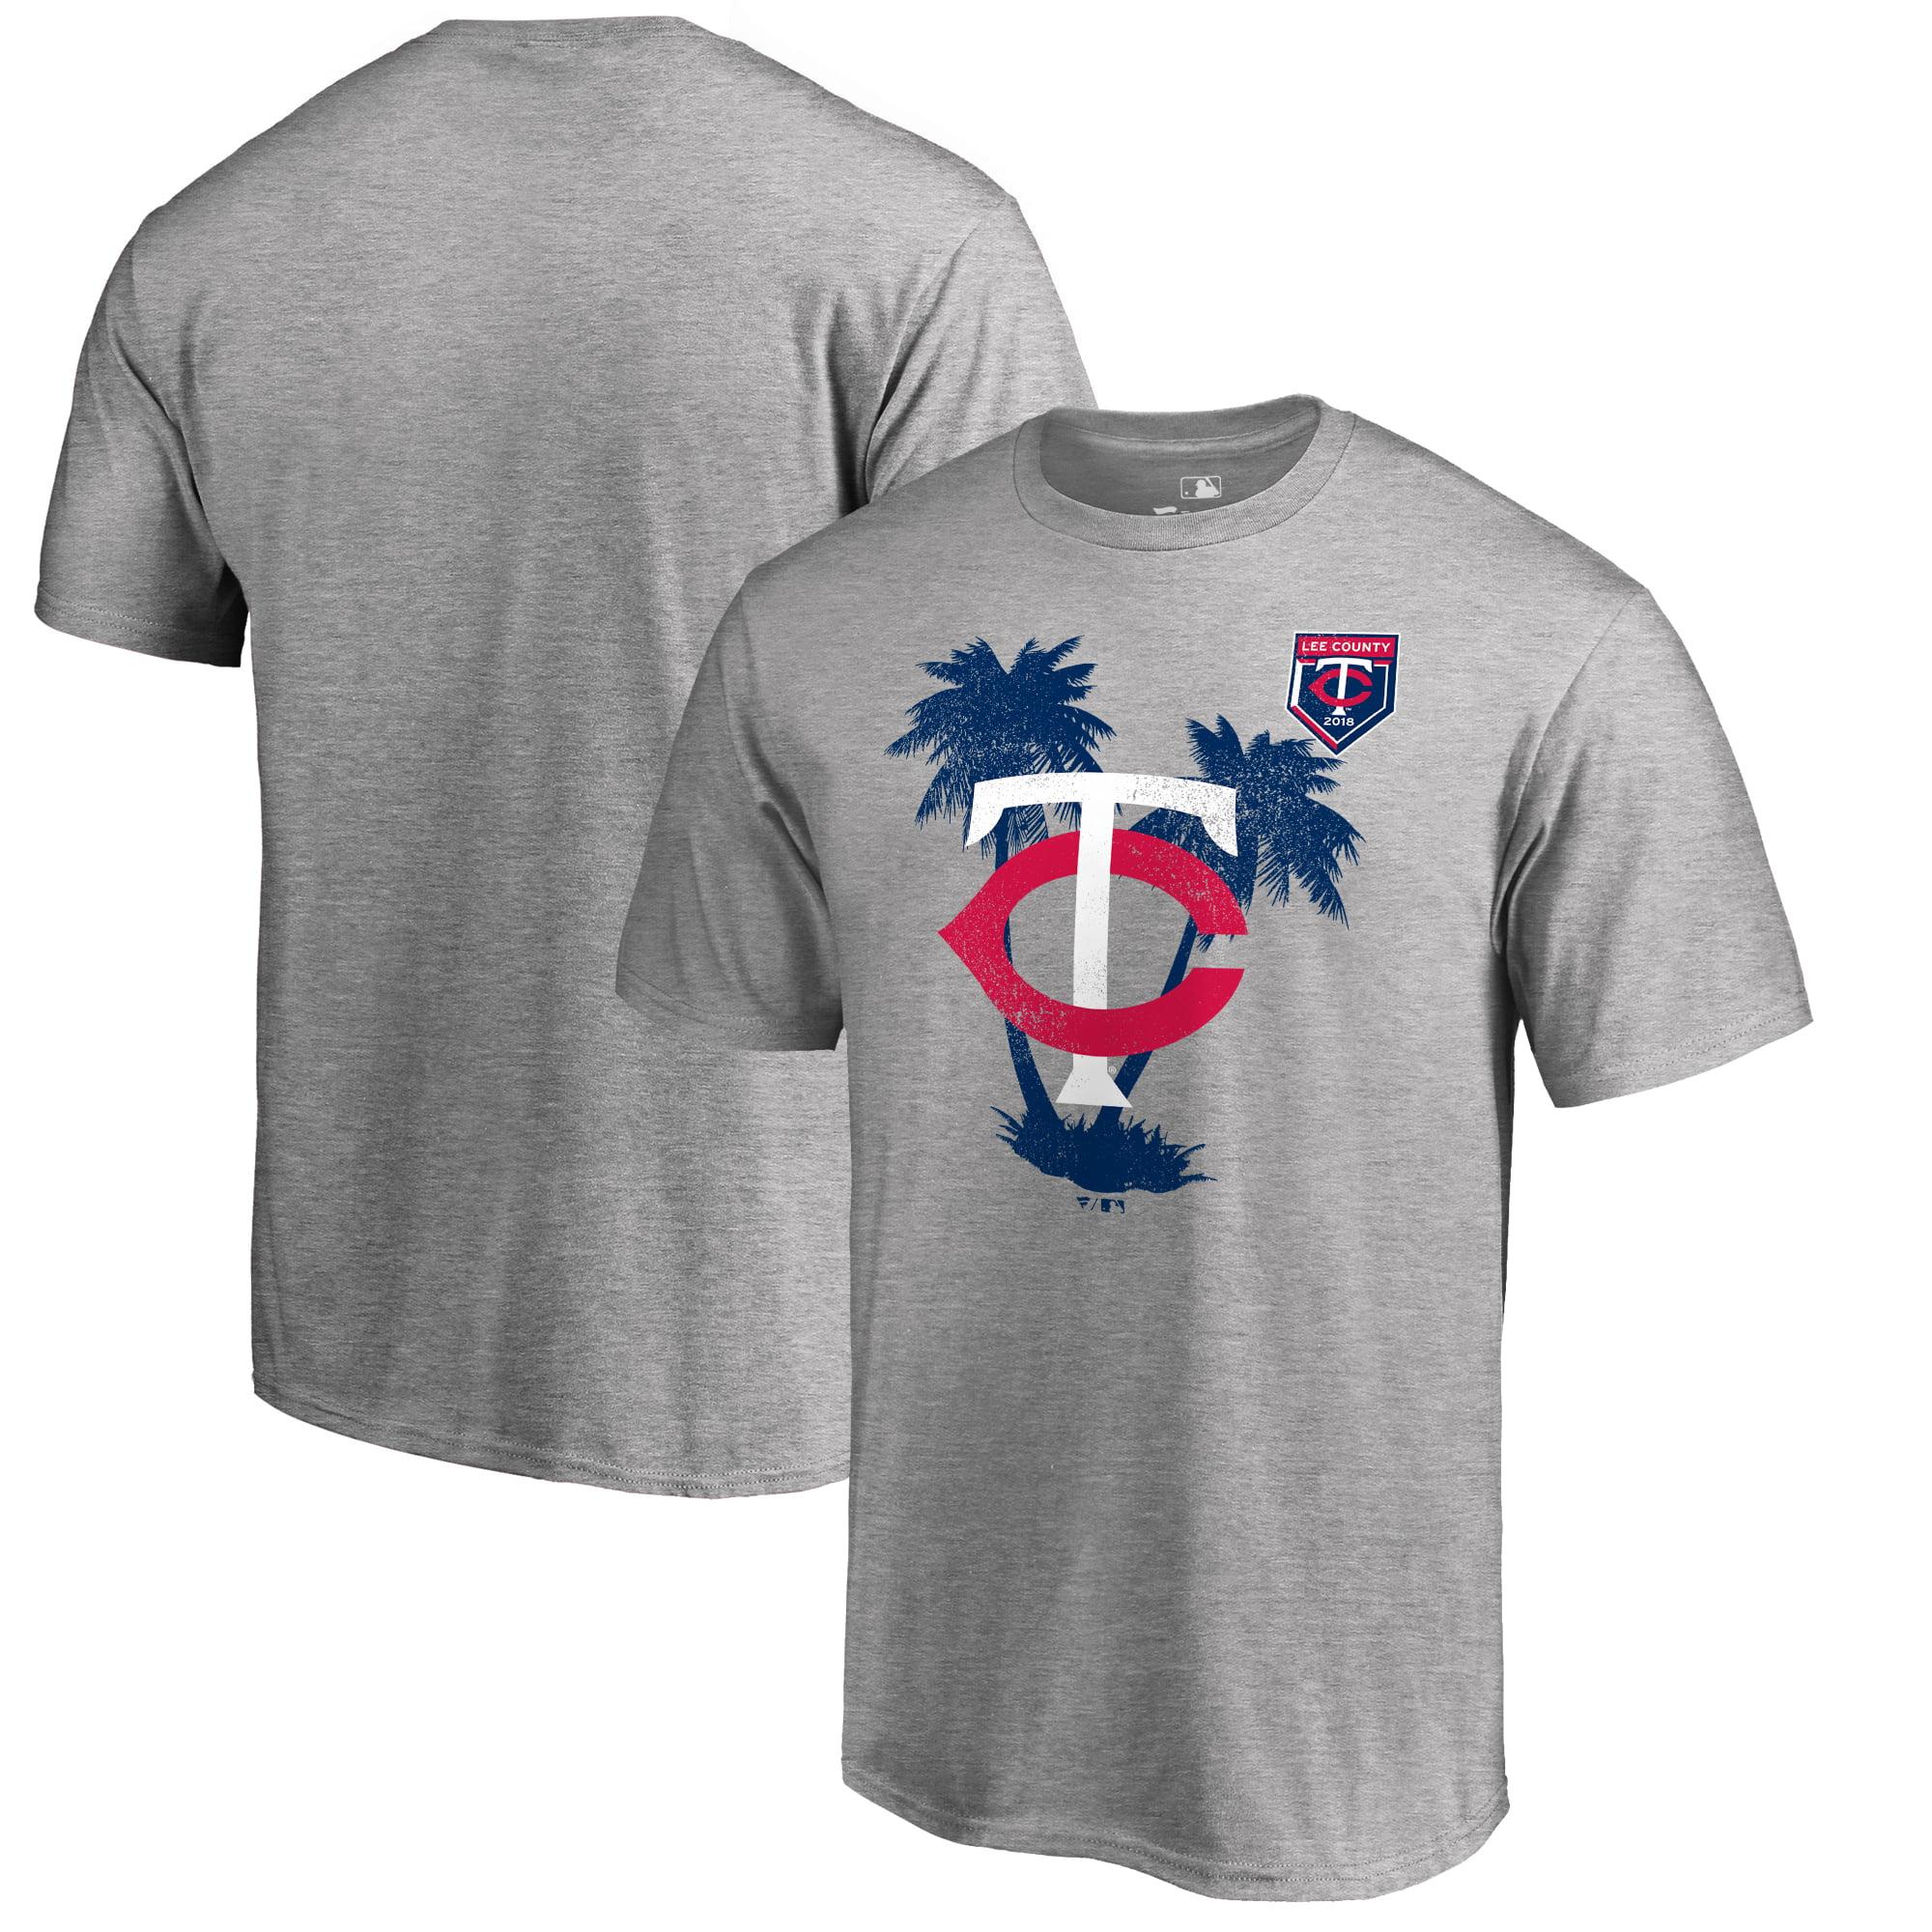 Minnesota Twins Fanatics Branded 2018 MLB Spring Training Vintage T-Shirt - Heather Gray